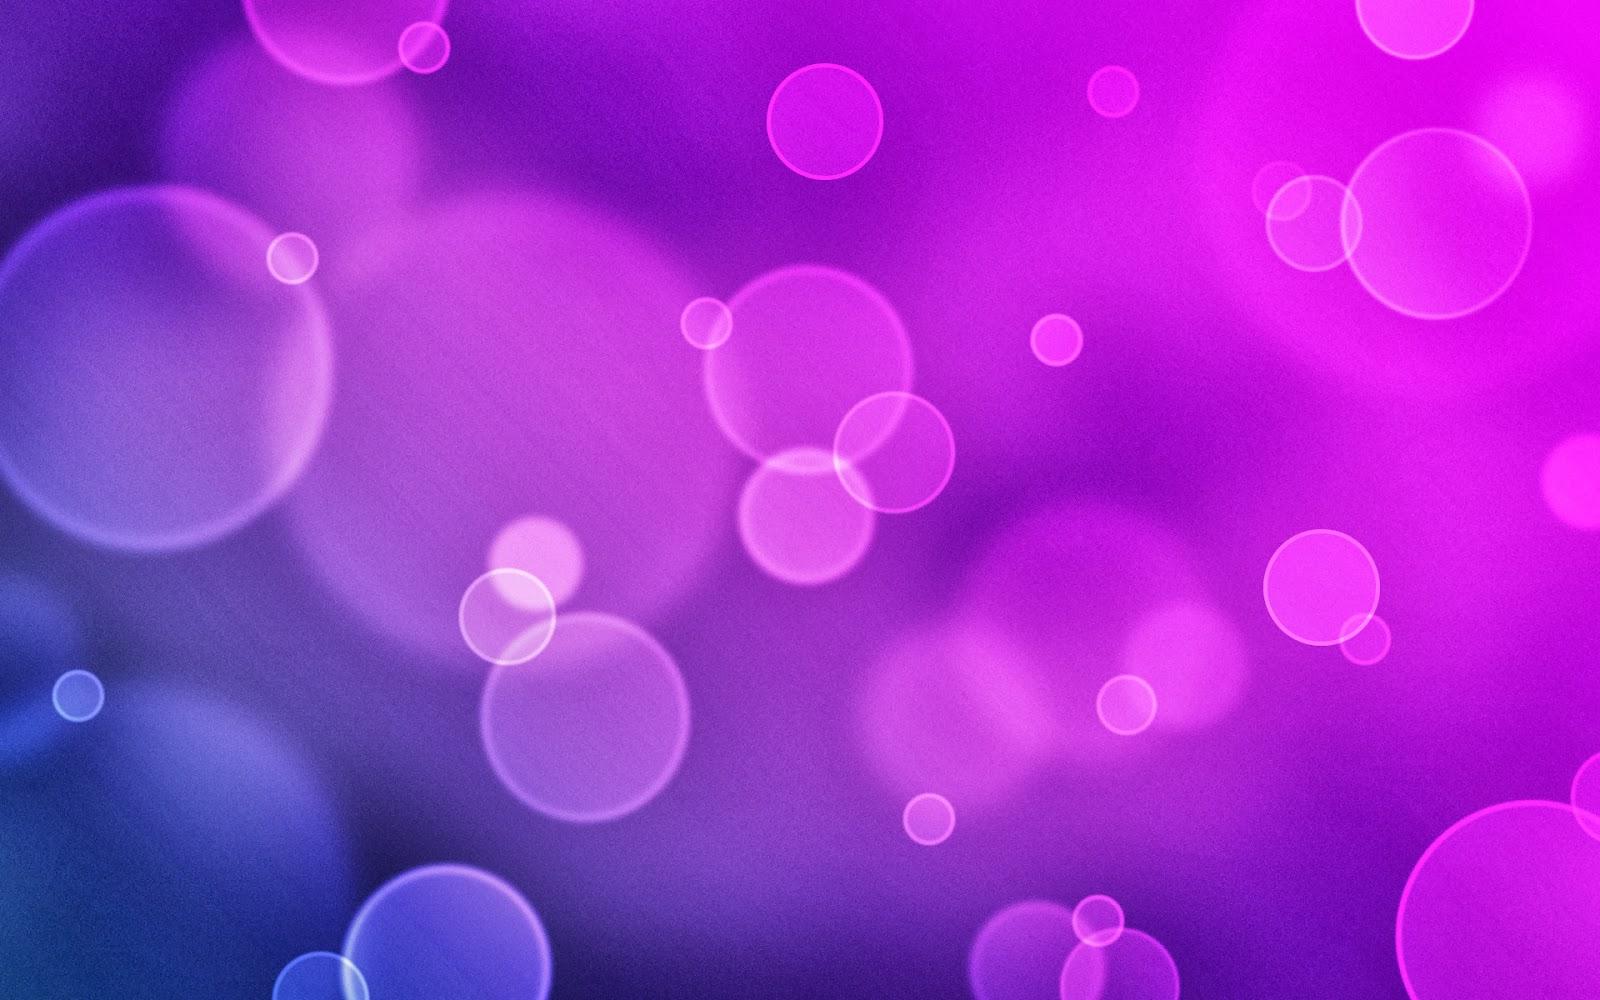 purple background images 1600x1000